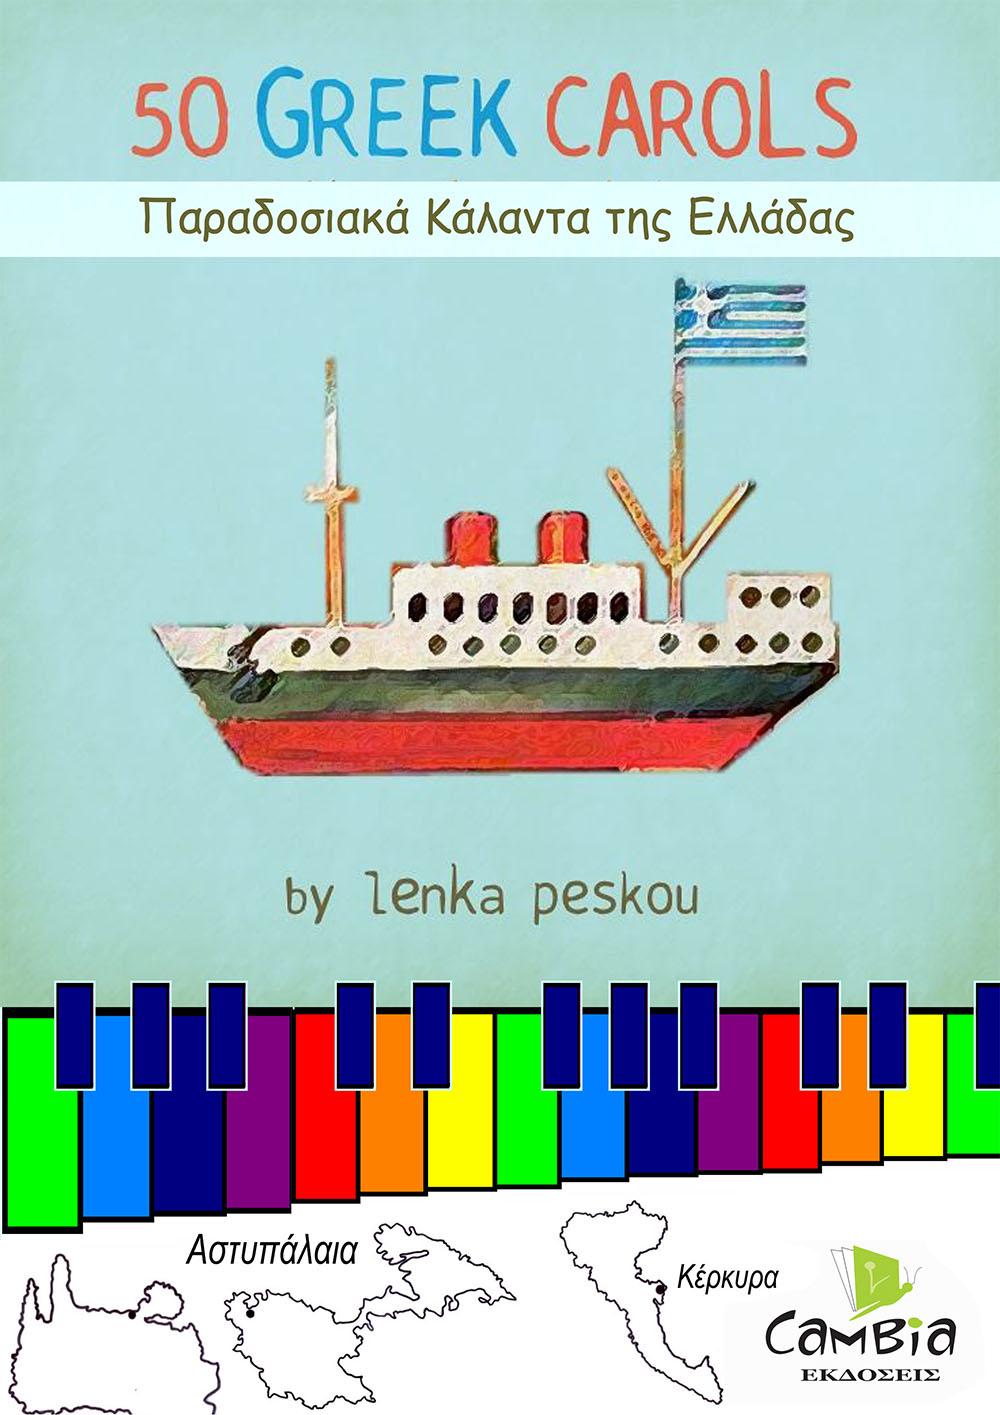 e-books    50 Παραδοσιακά Κάλαντα της Ελλάδας - Λένκα Πέσκου e-book ... f23433d3f45